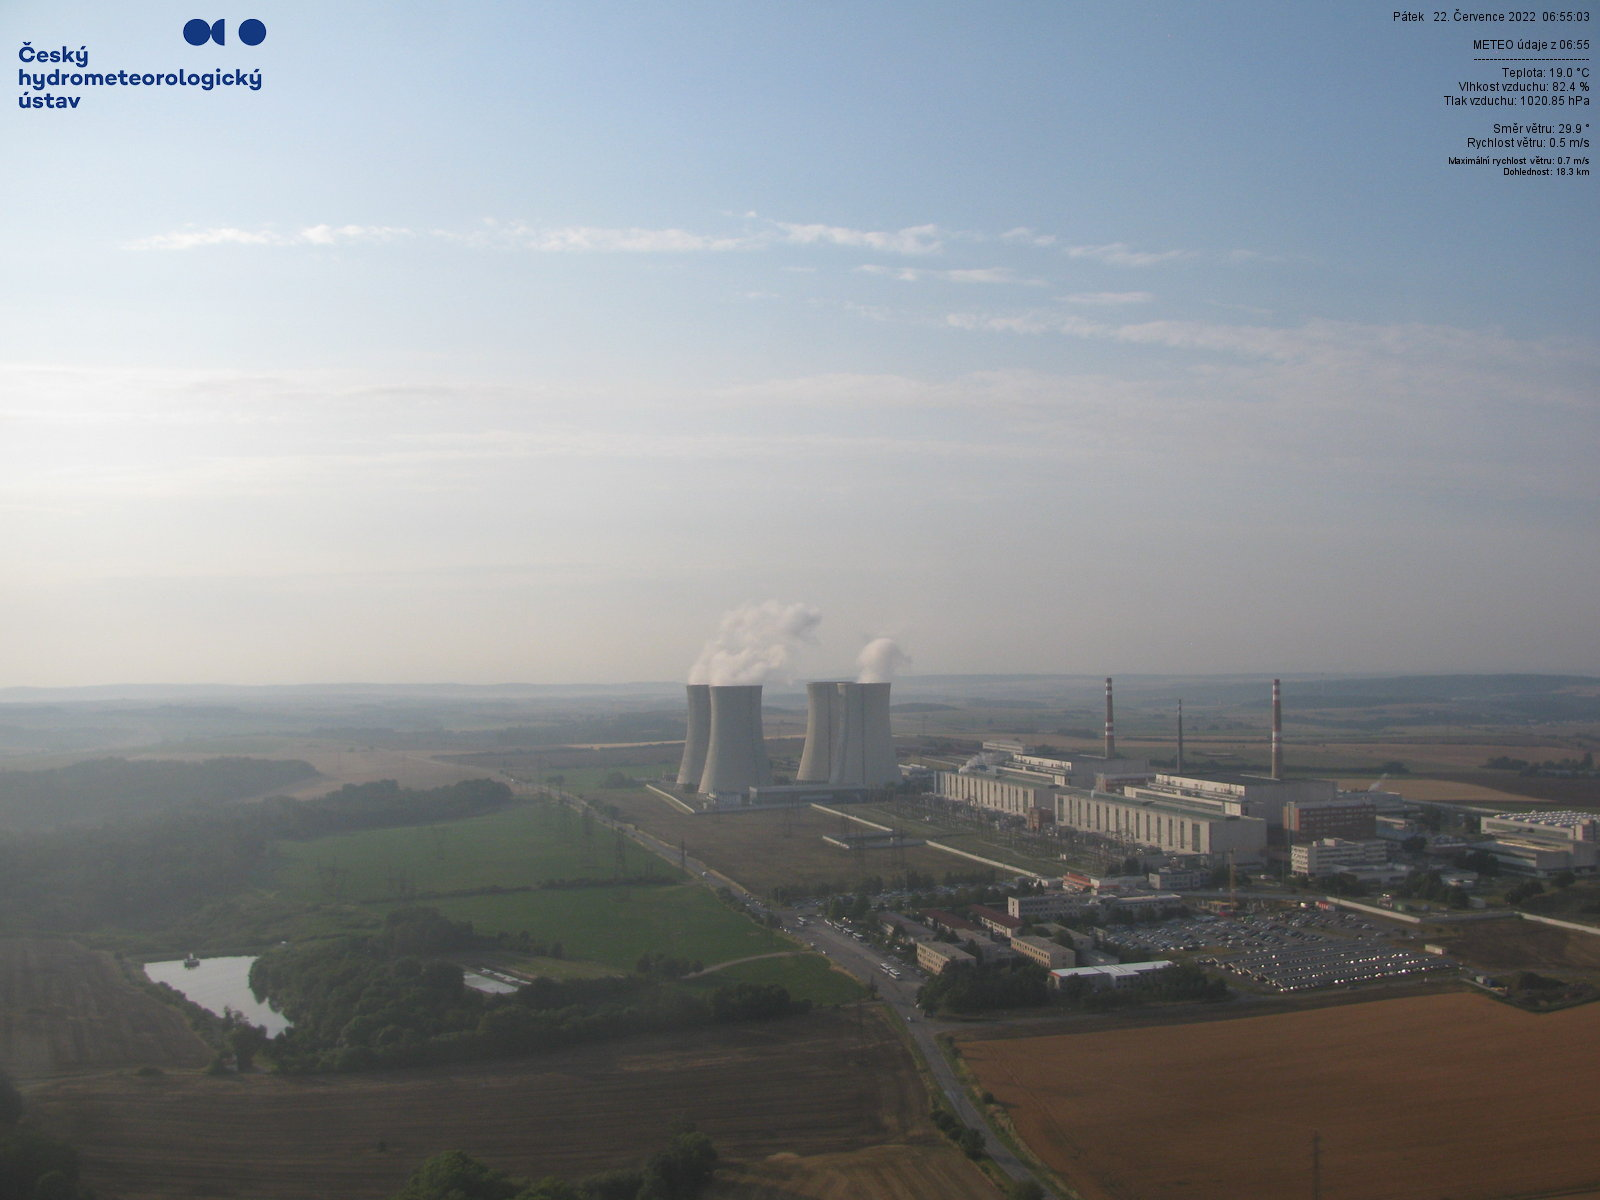 Pohled na jadernou elektrárnu